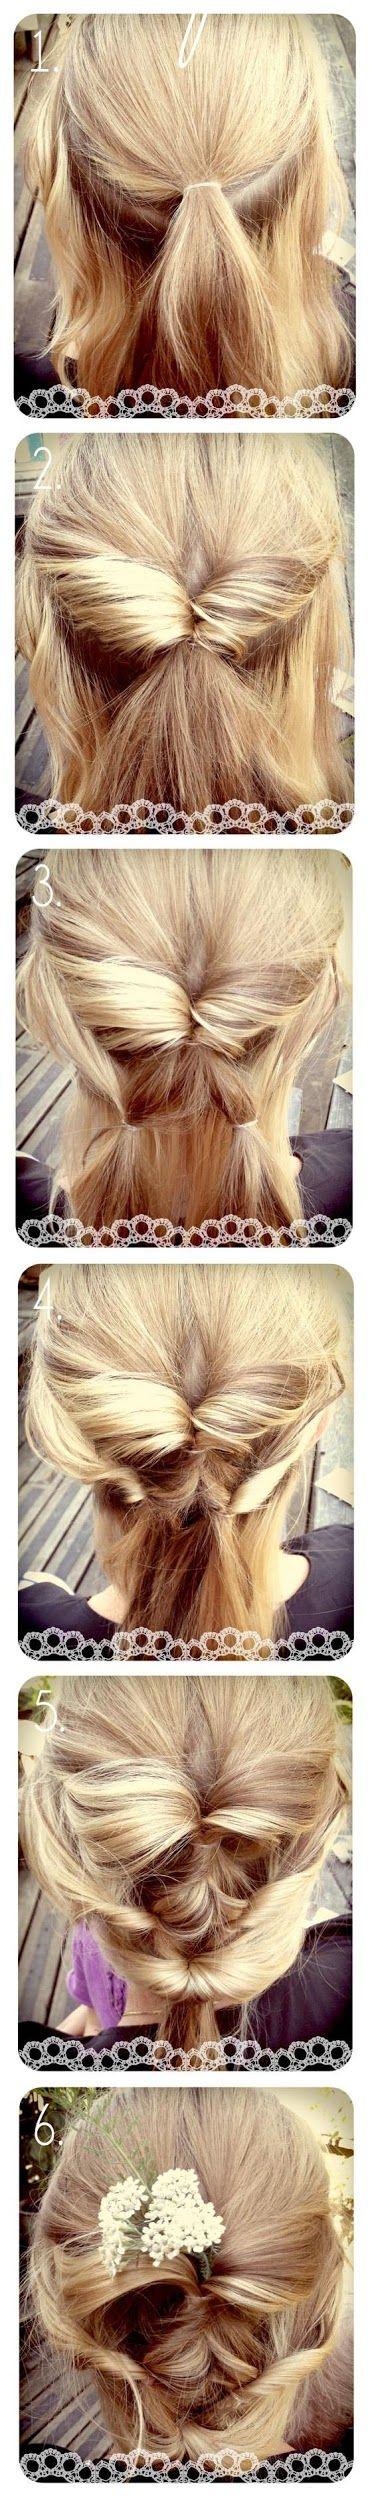 Make a Diy Wedding Hair   hairstyles tutorial